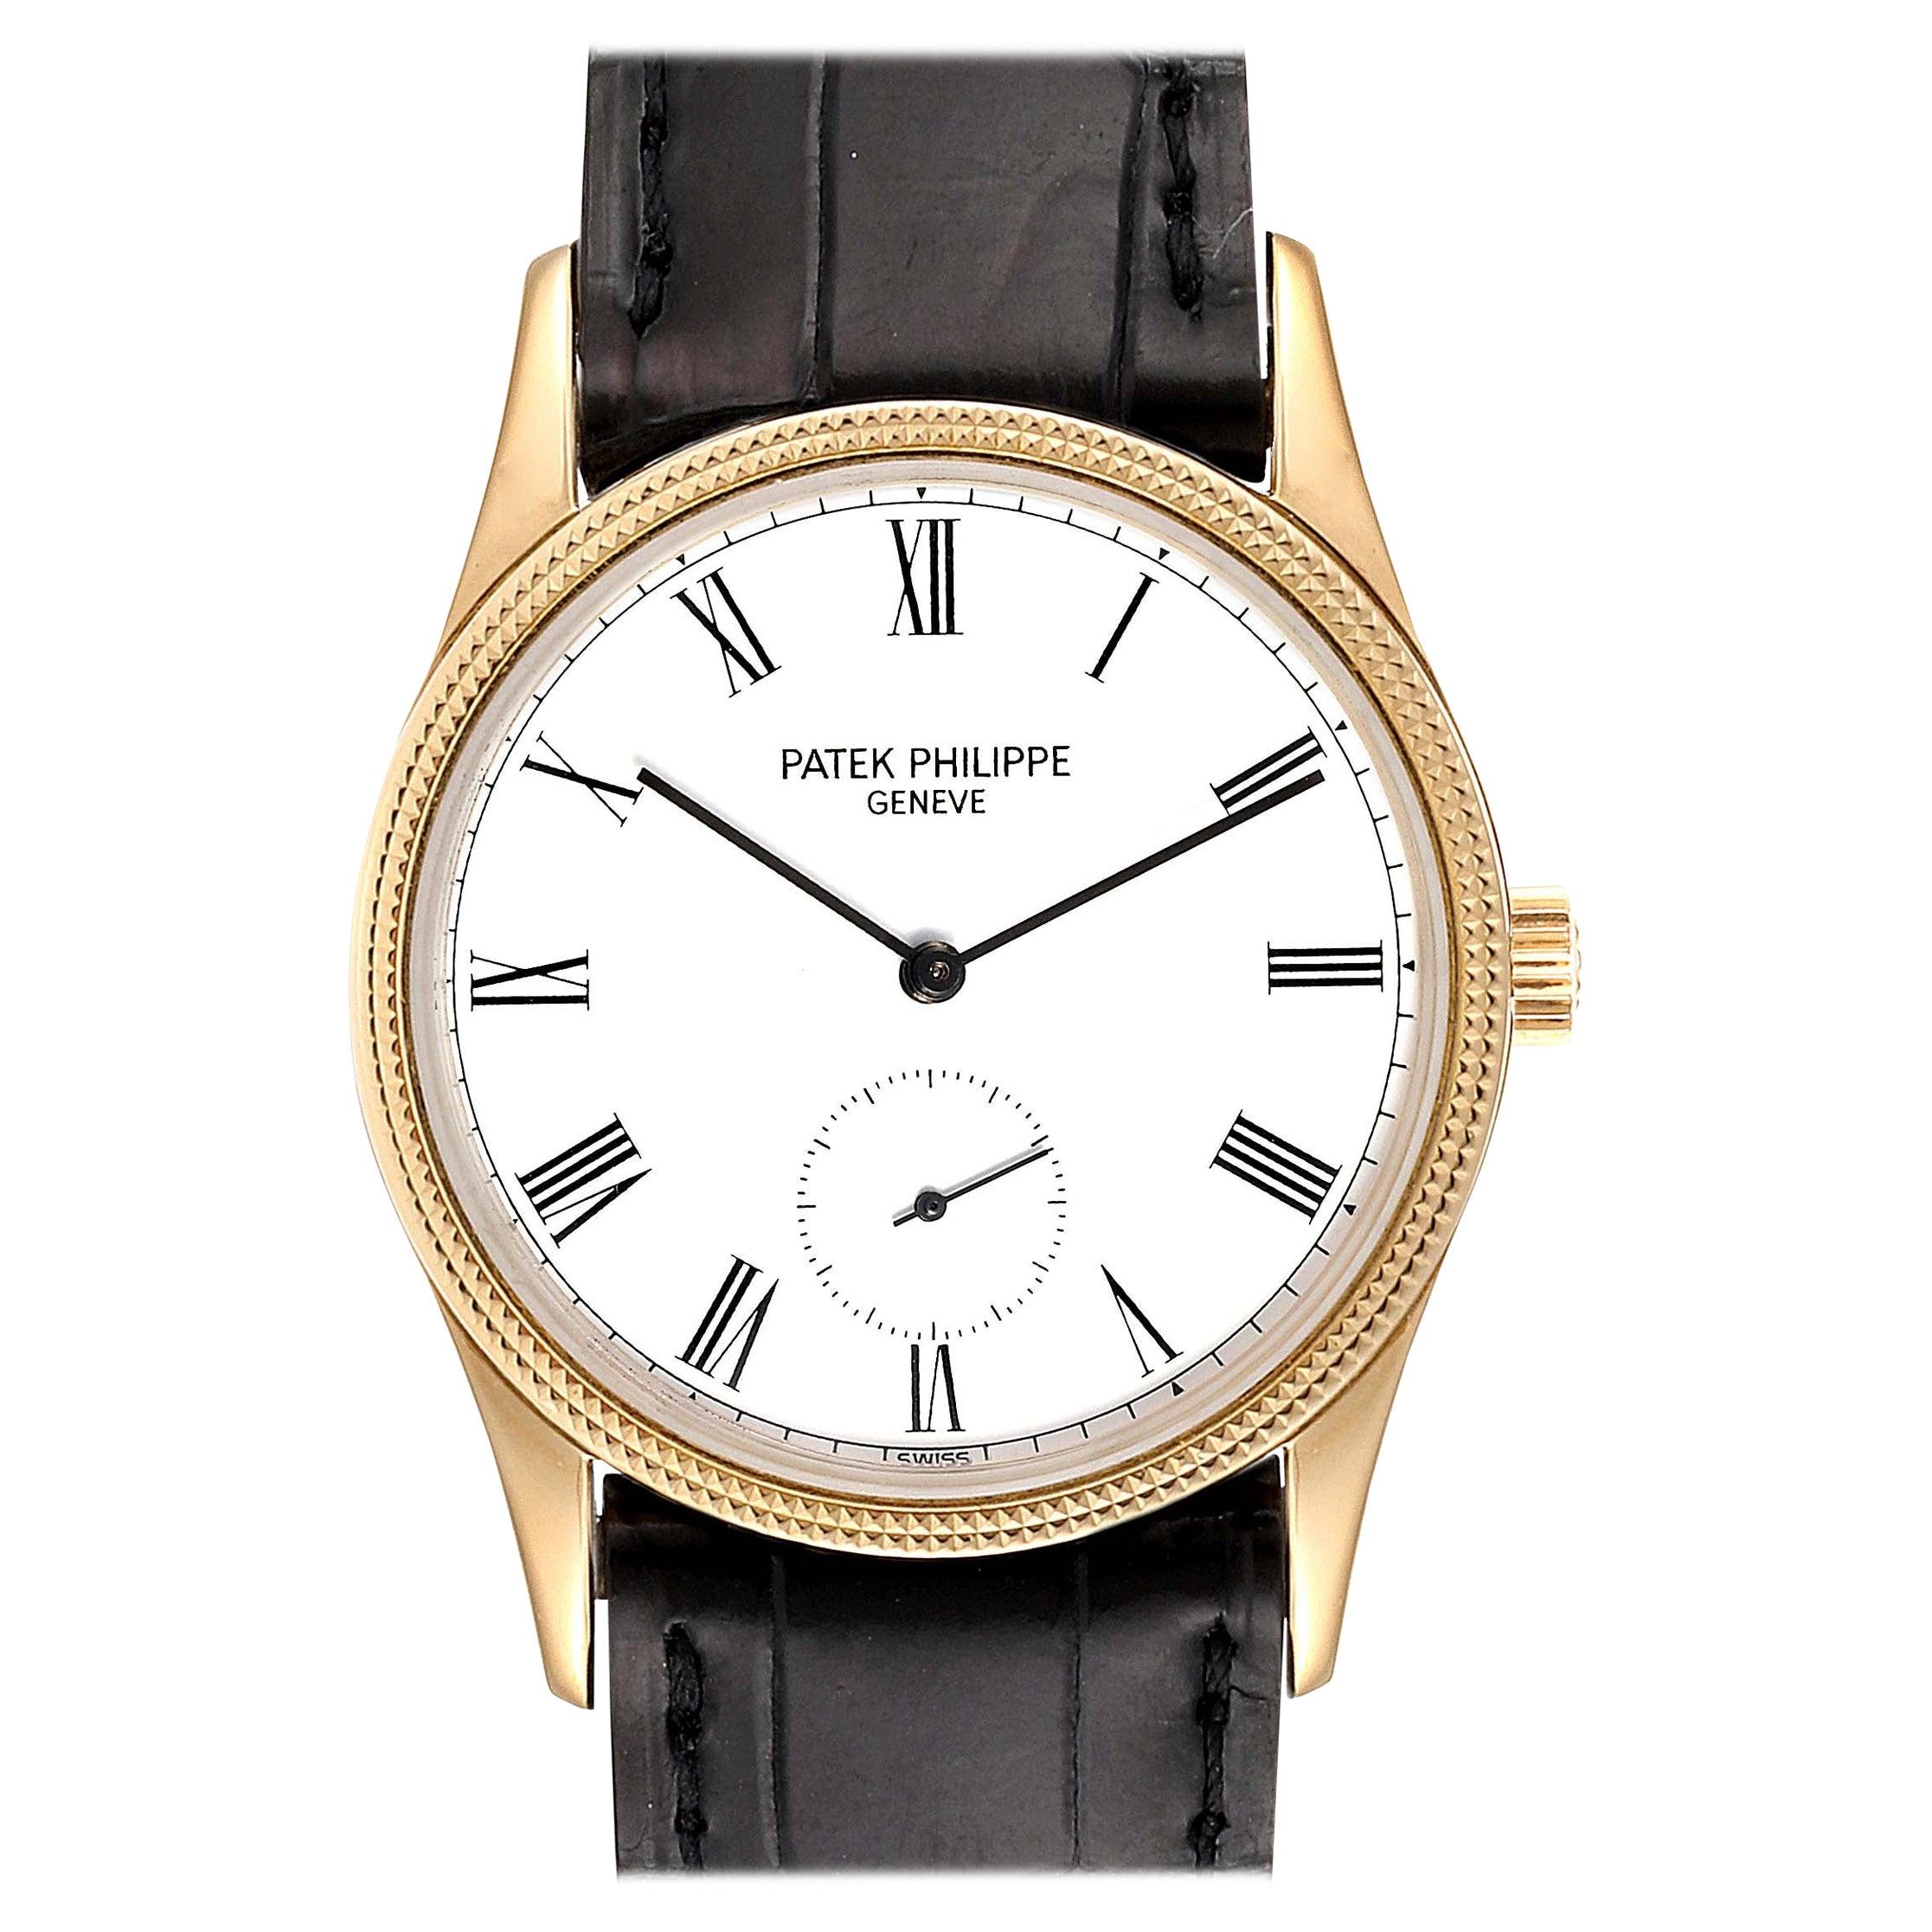 Patek Philippe Calatrava 18 Karat Rose Gold Vintage Watch 3796